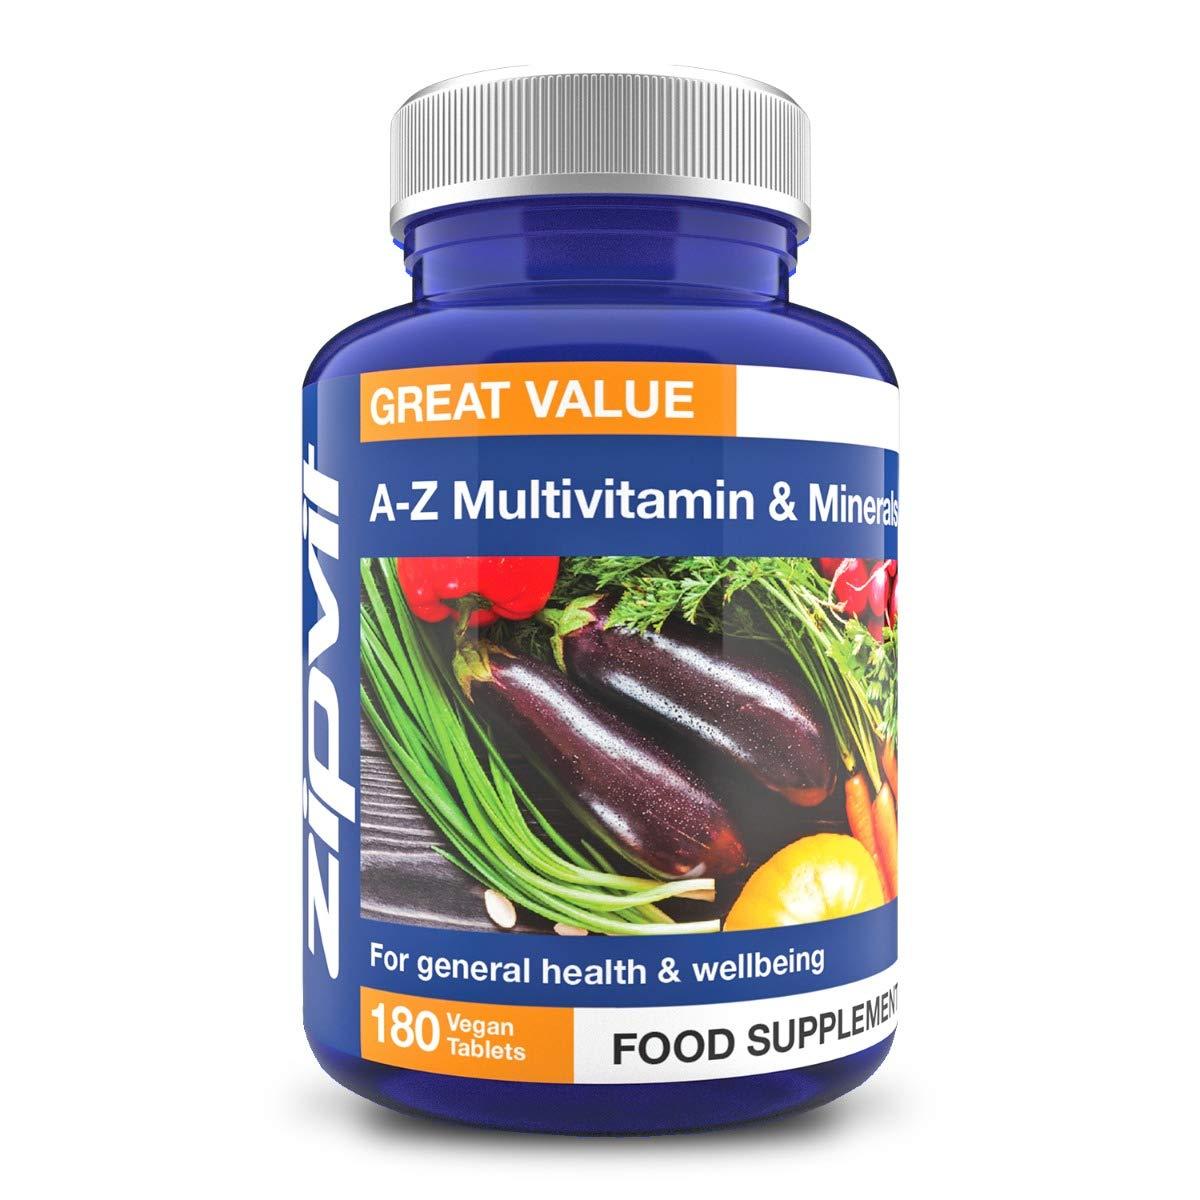 Vegan Multivitamins & Minerals A-Z Formula, 180 Tablets. Includes Vitamin B12 & D3, Provides 25 Vitamins, Minerals & Micronutrients. Vegetarian Society Approved.